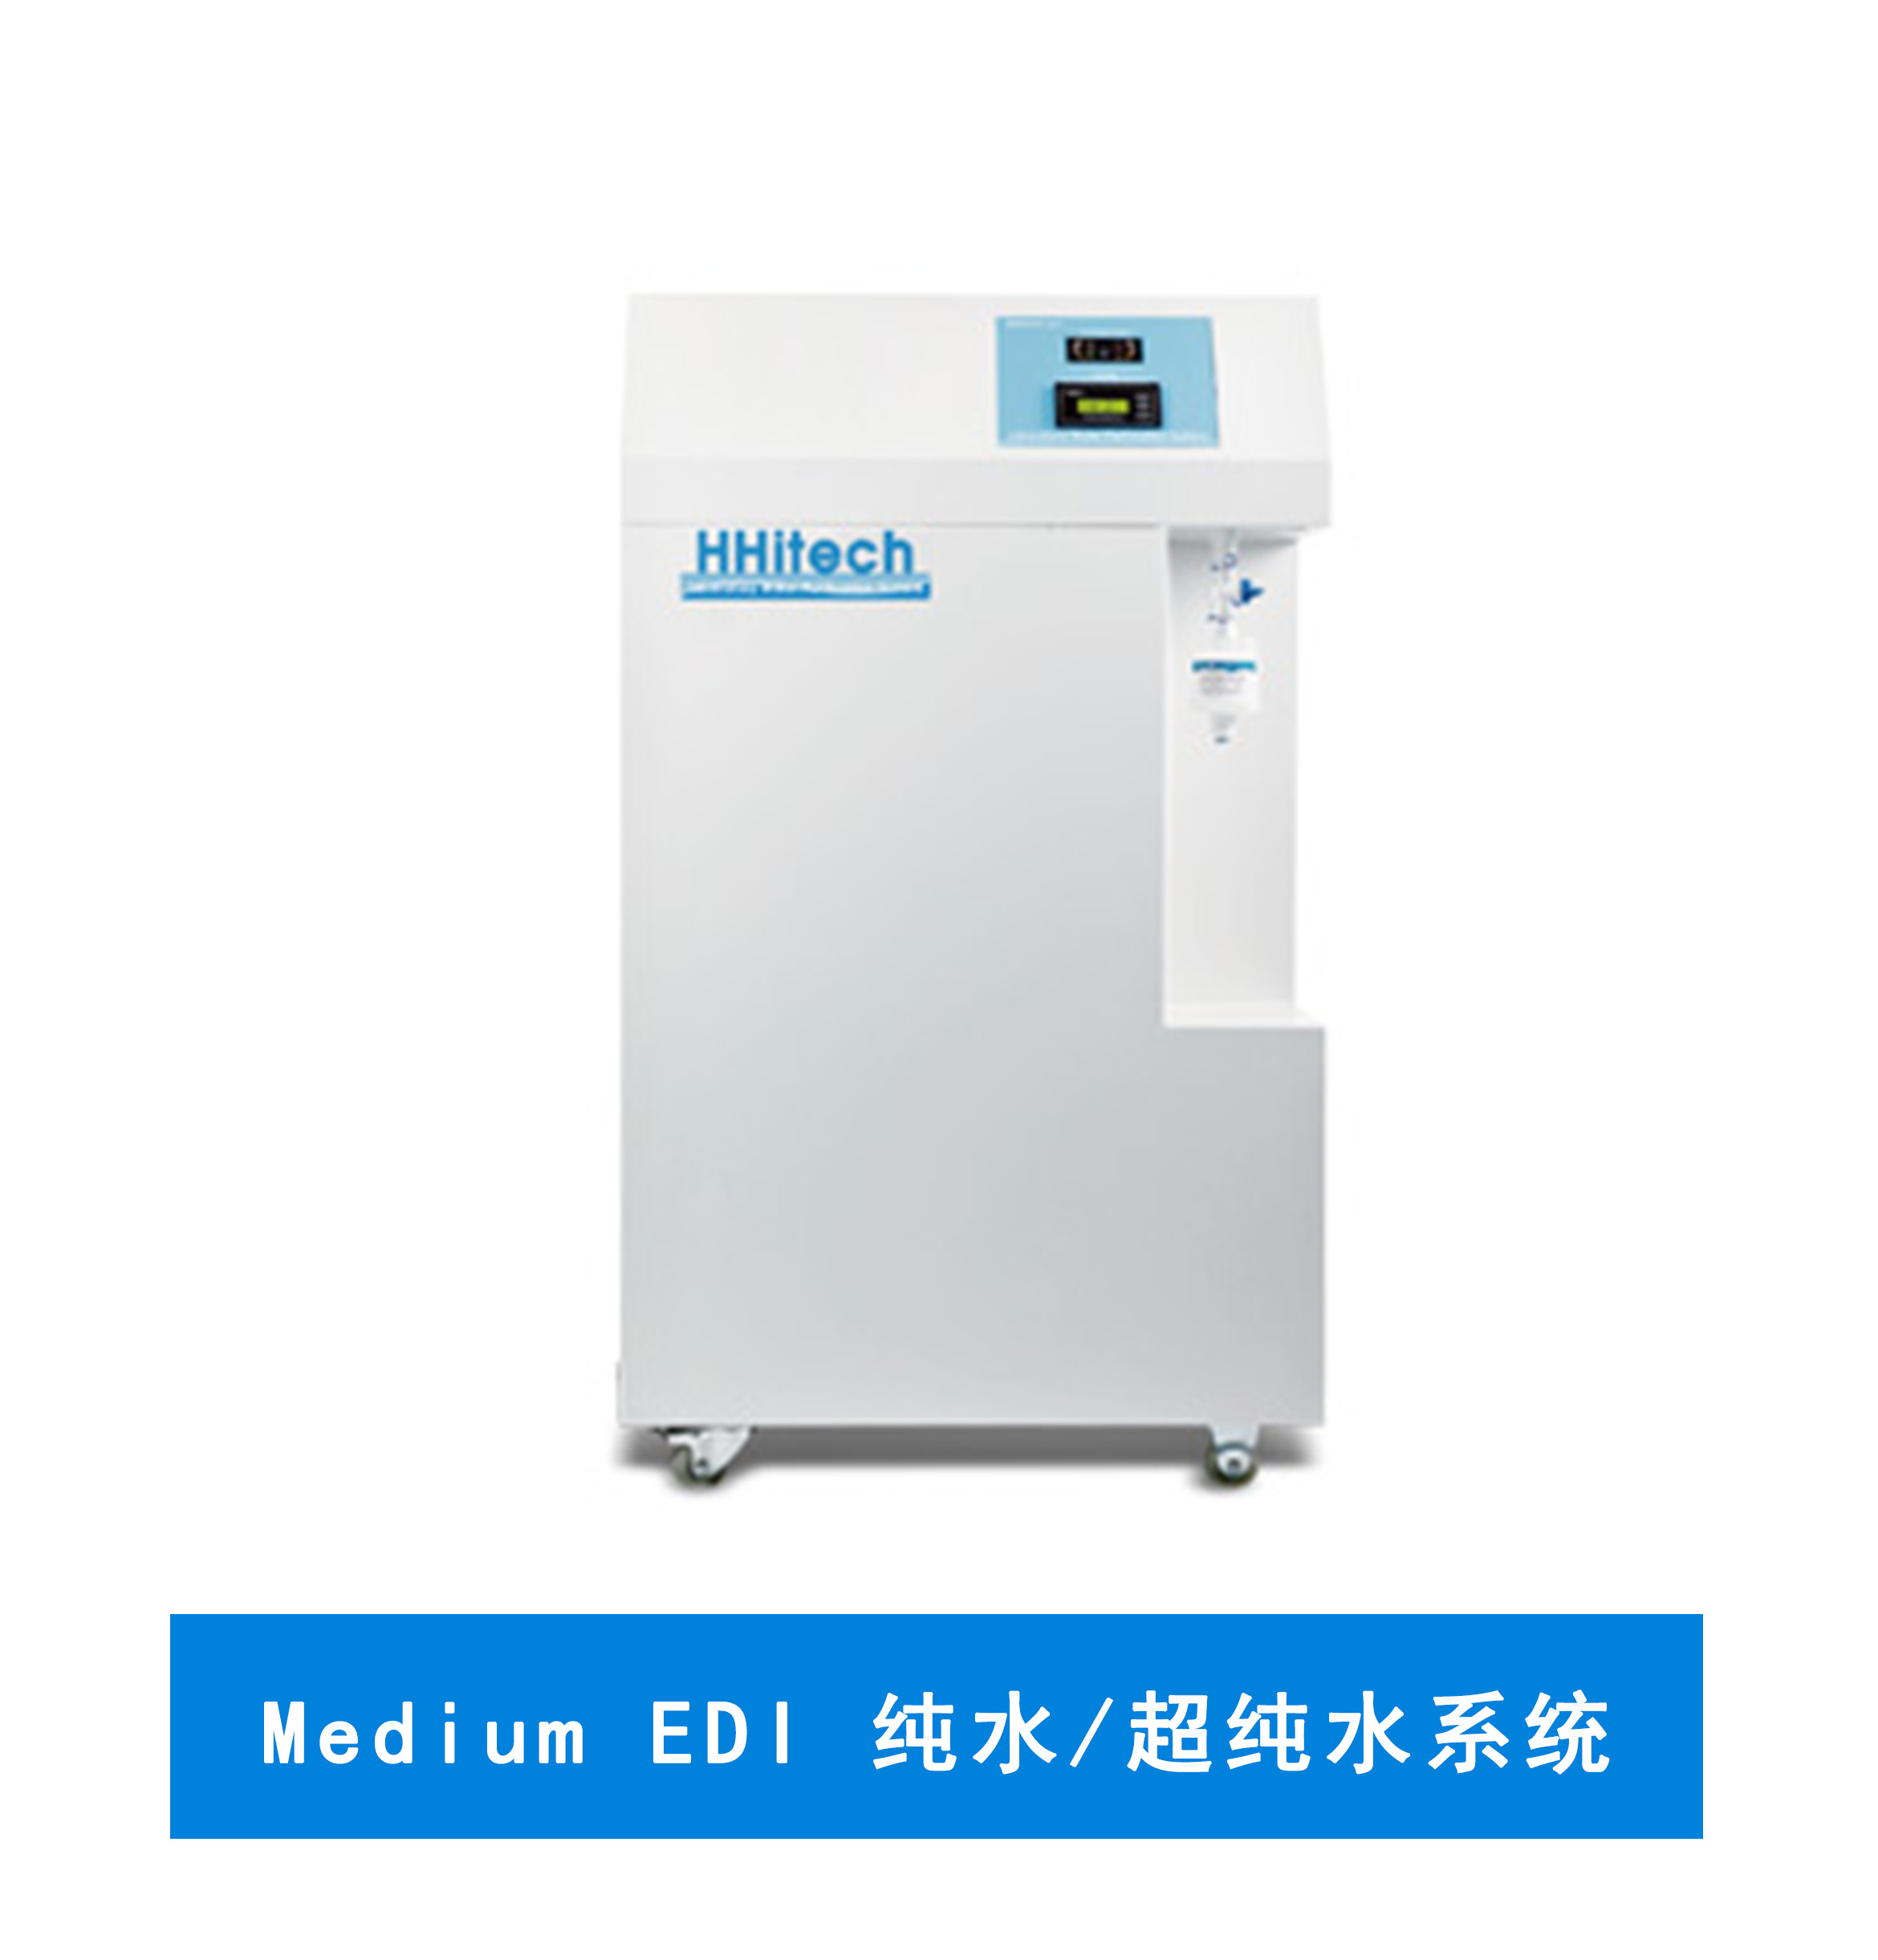 Medium EDI纯水/超纯水系统